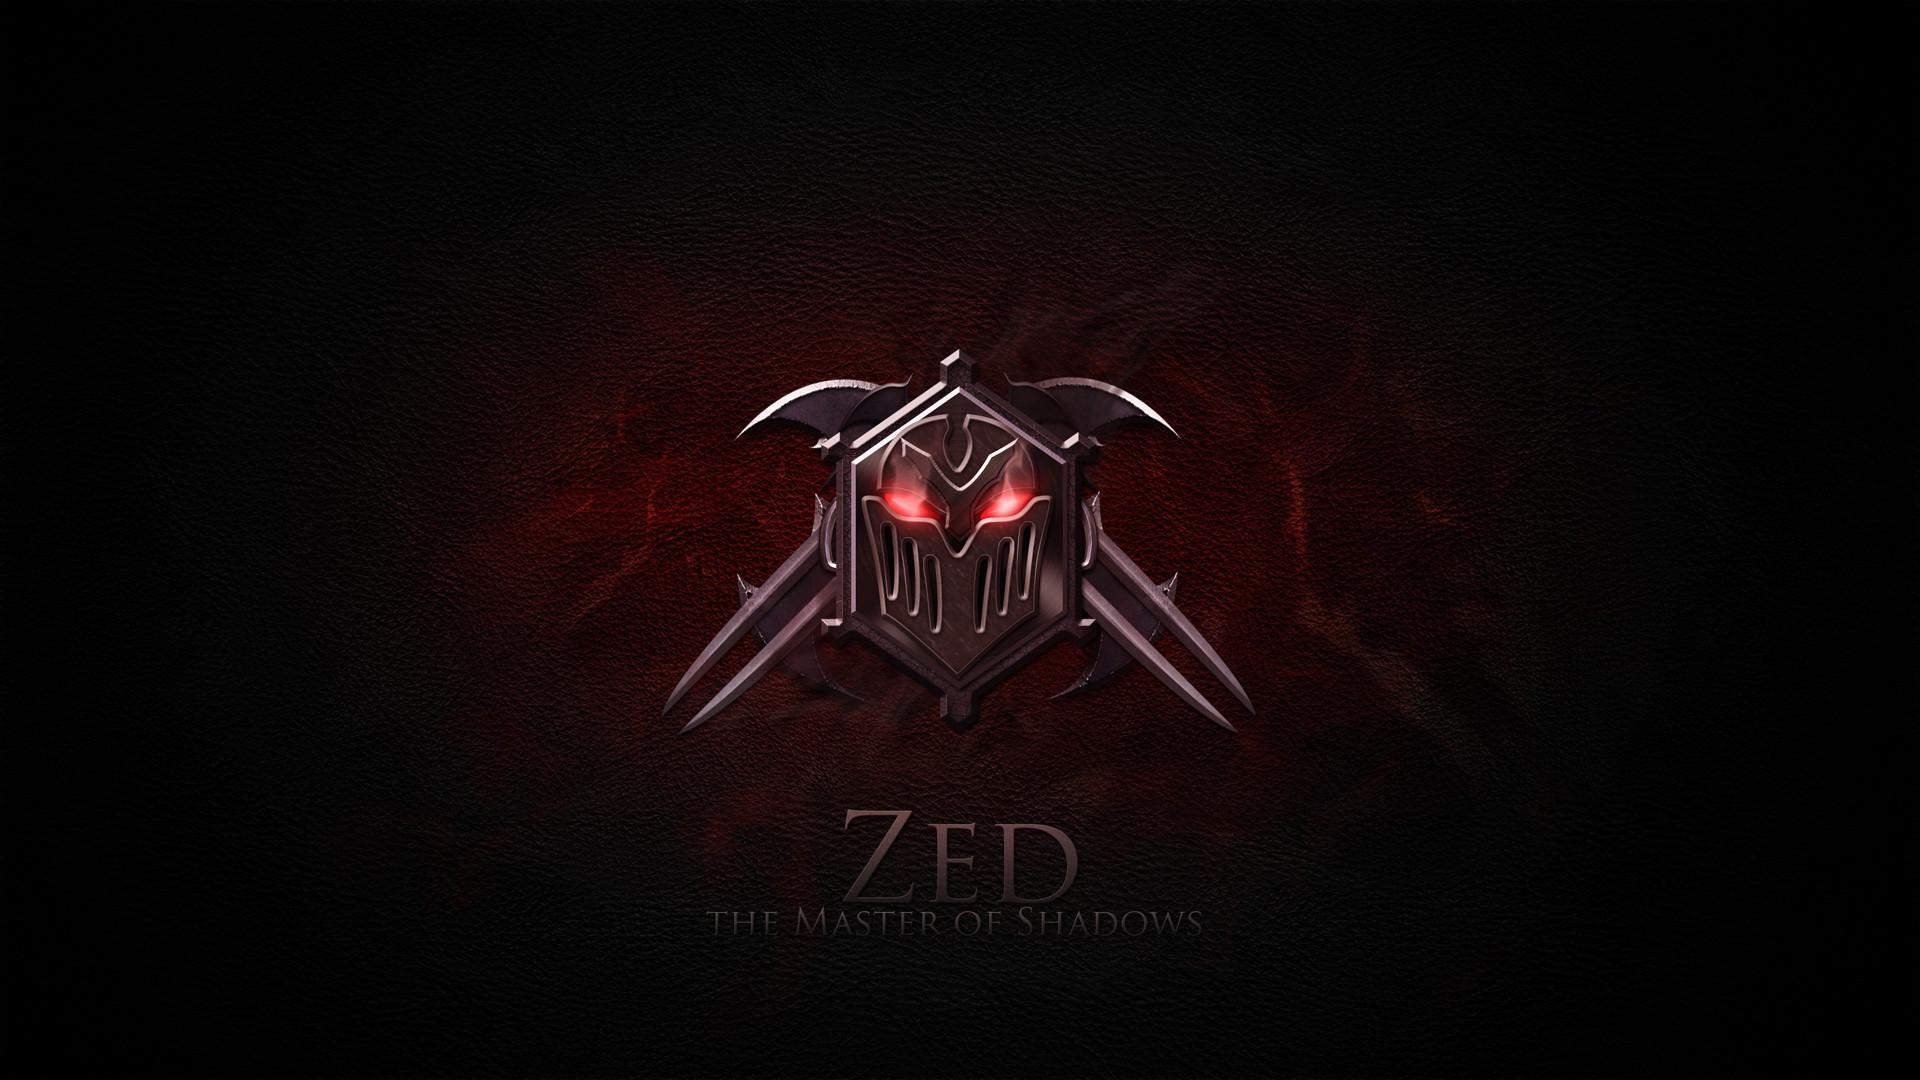 Zed Photos